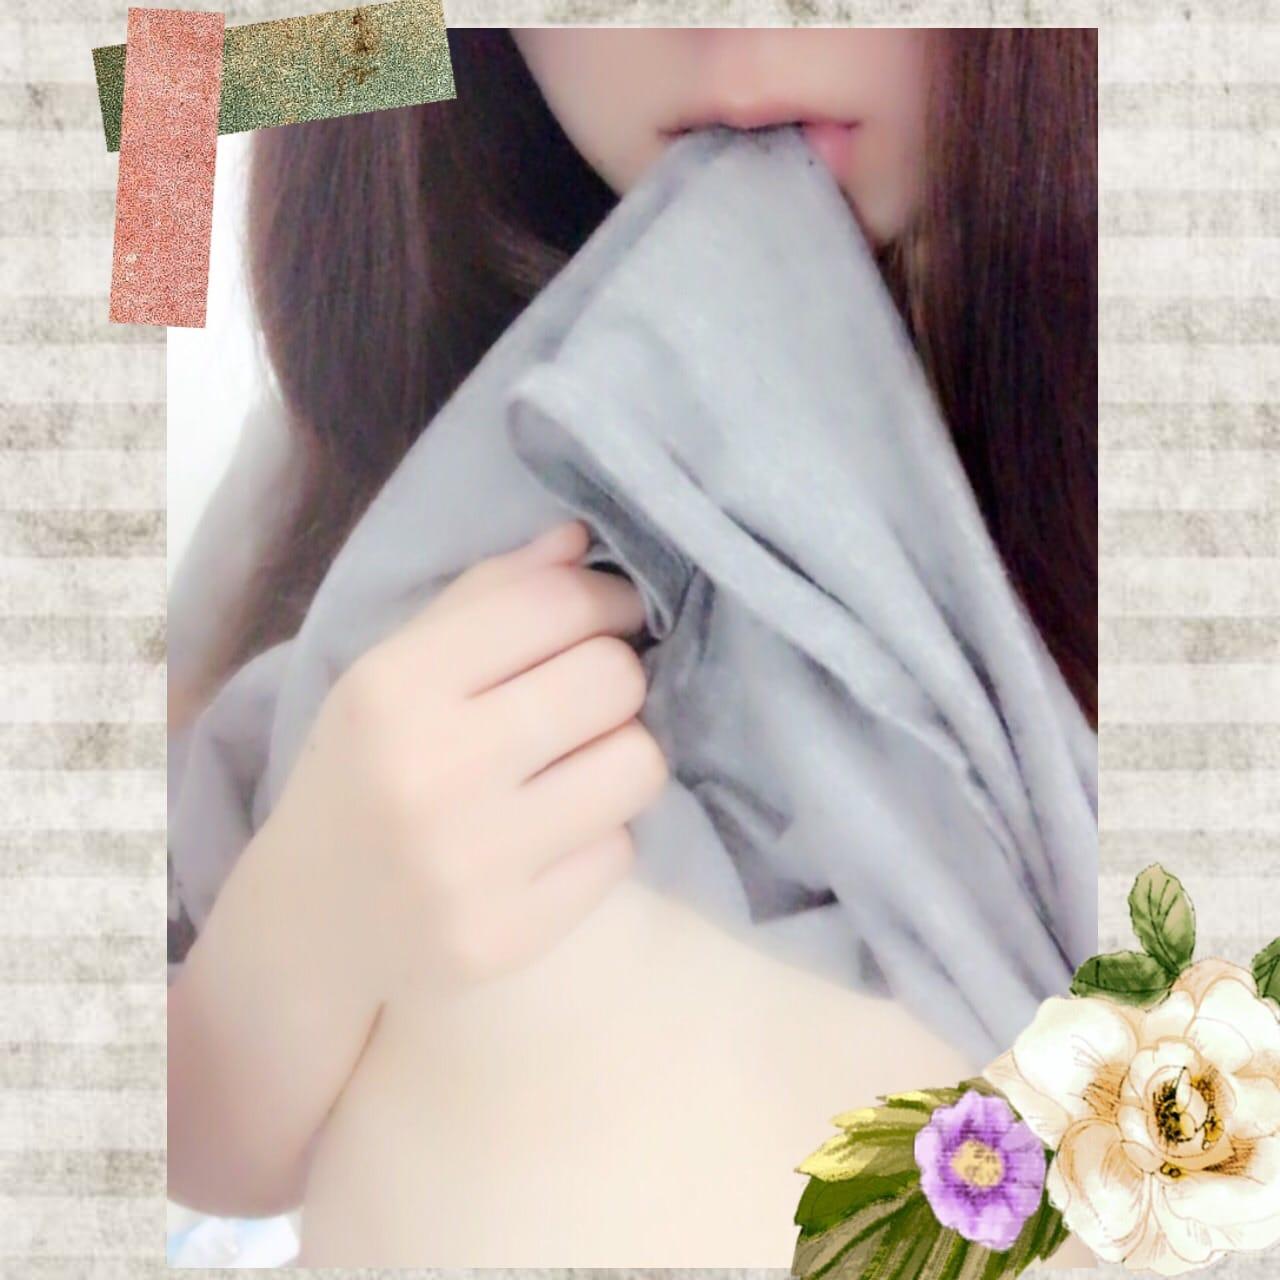 「୧(๑•̀ㅁ•́๑)૭✧」09/28(09/28) 11:13   Hina-ひな-の写メ・風俗動画